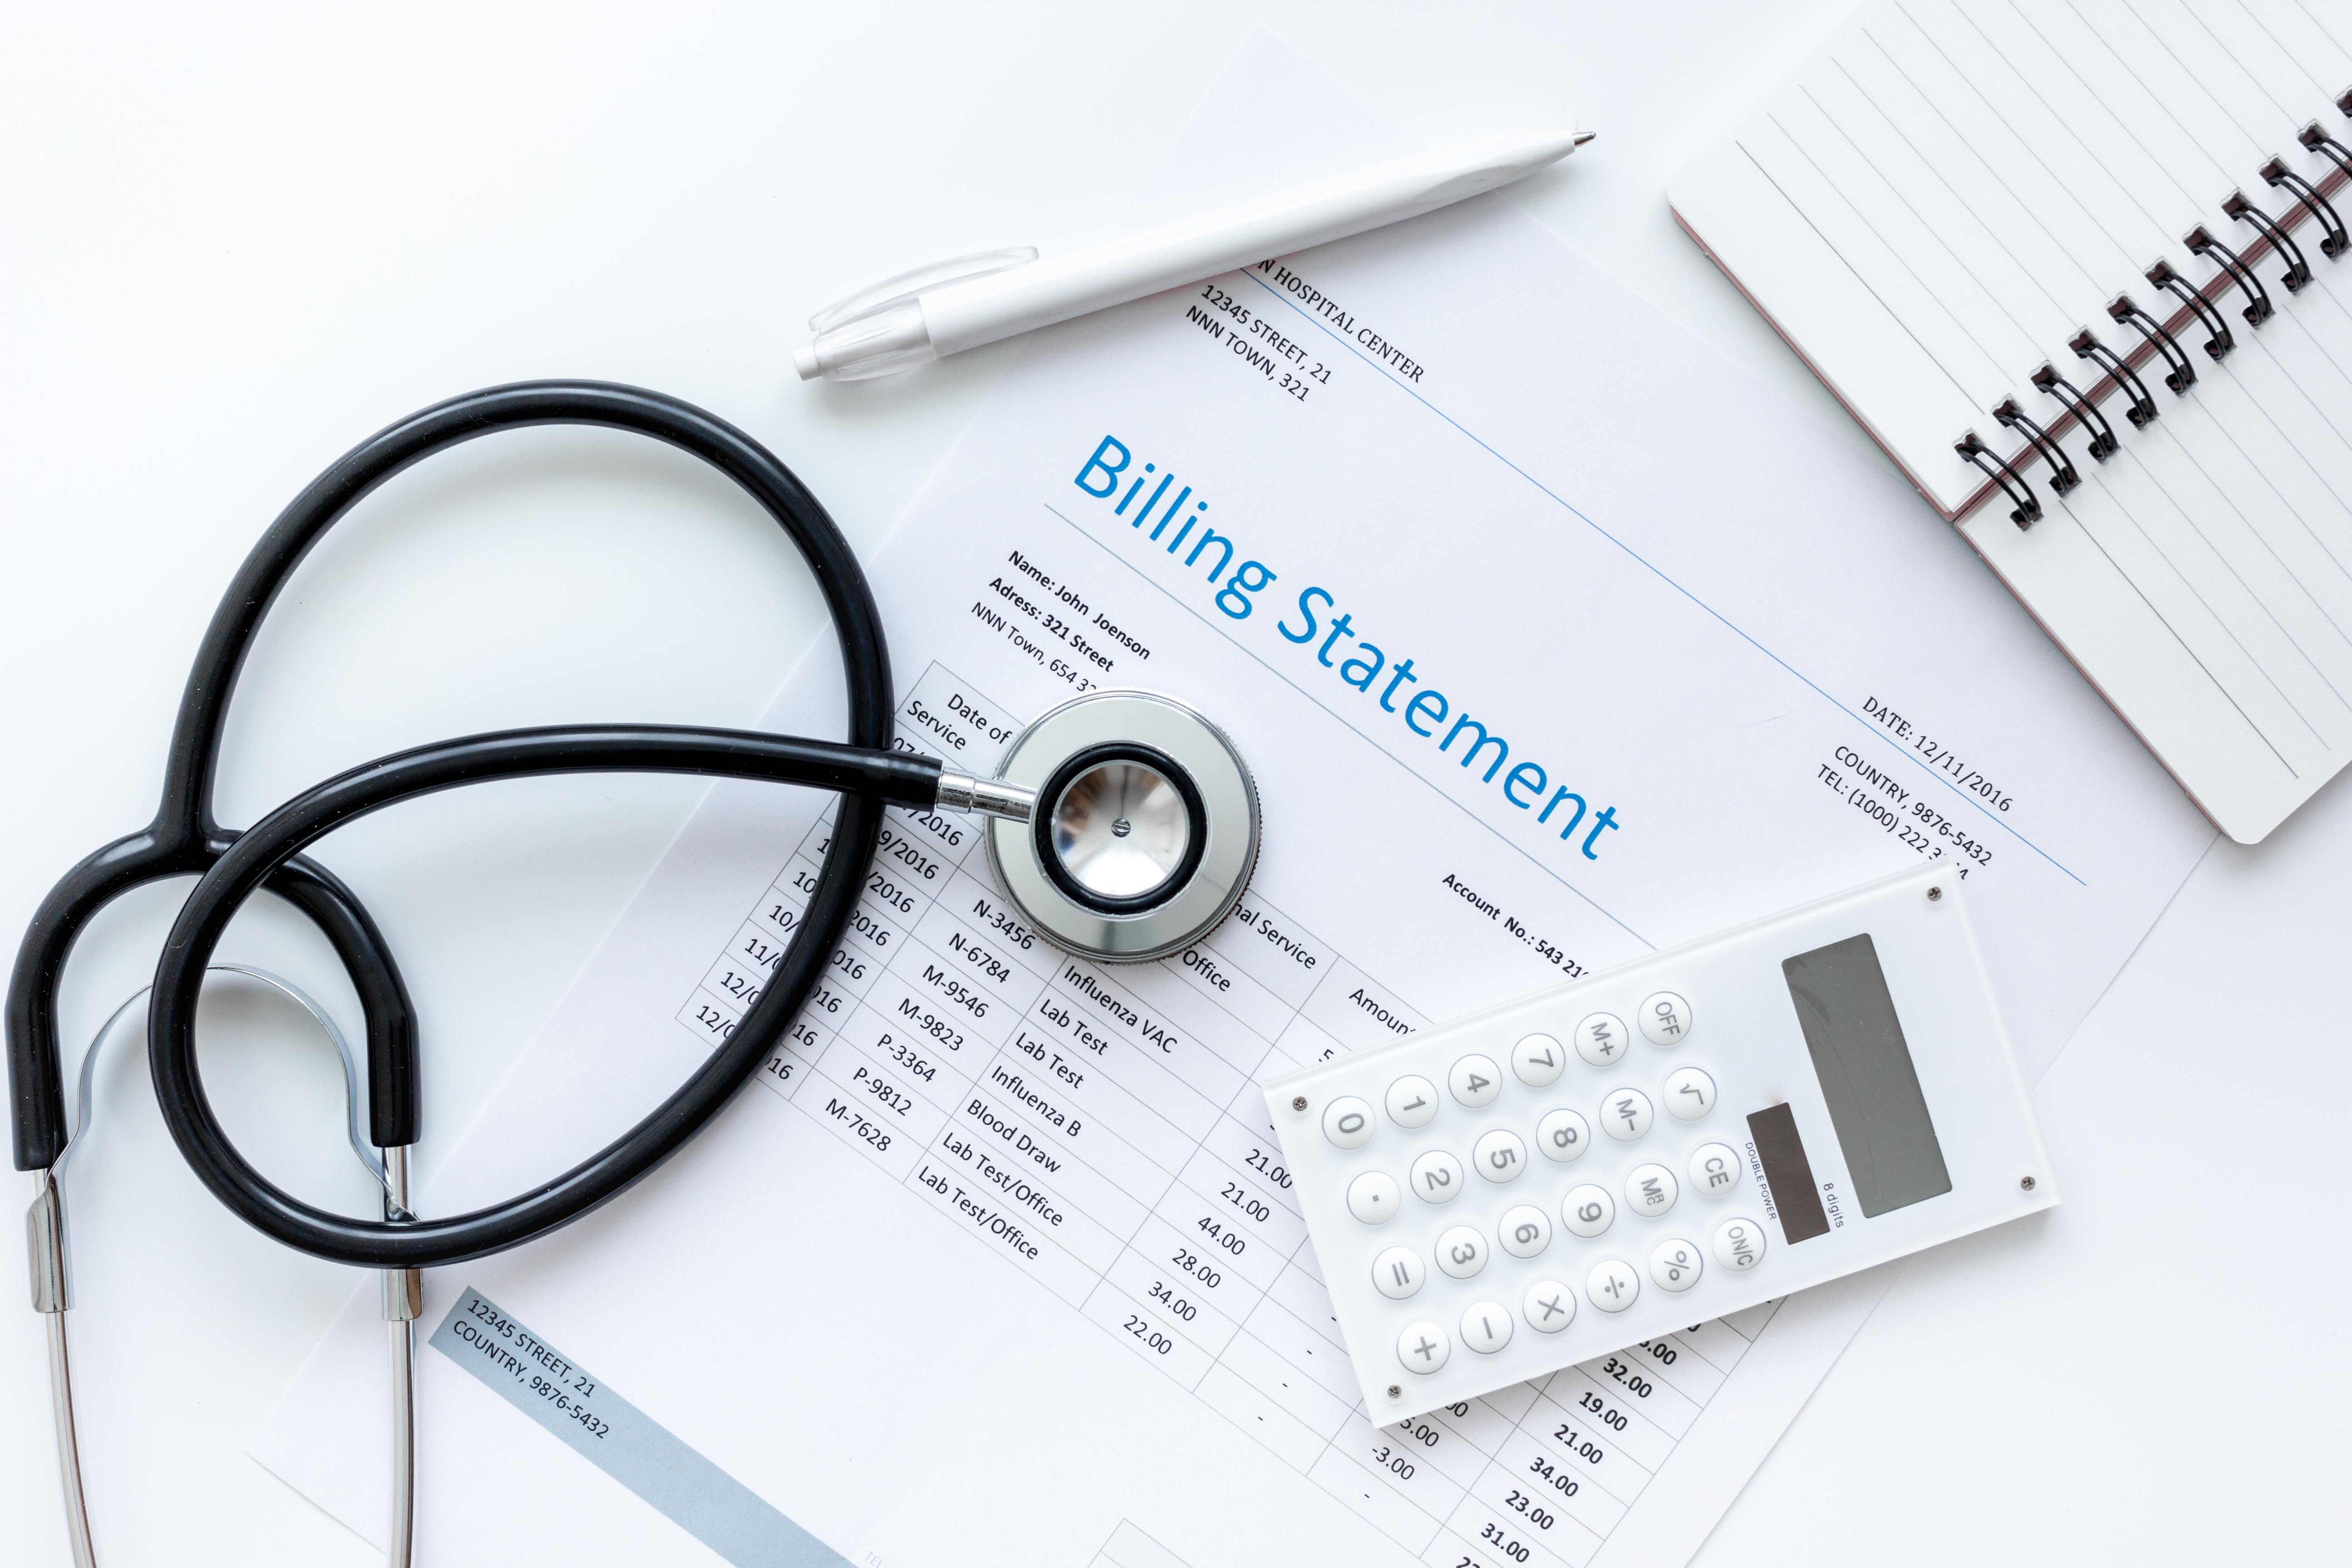 AIM System EMS Billing Services